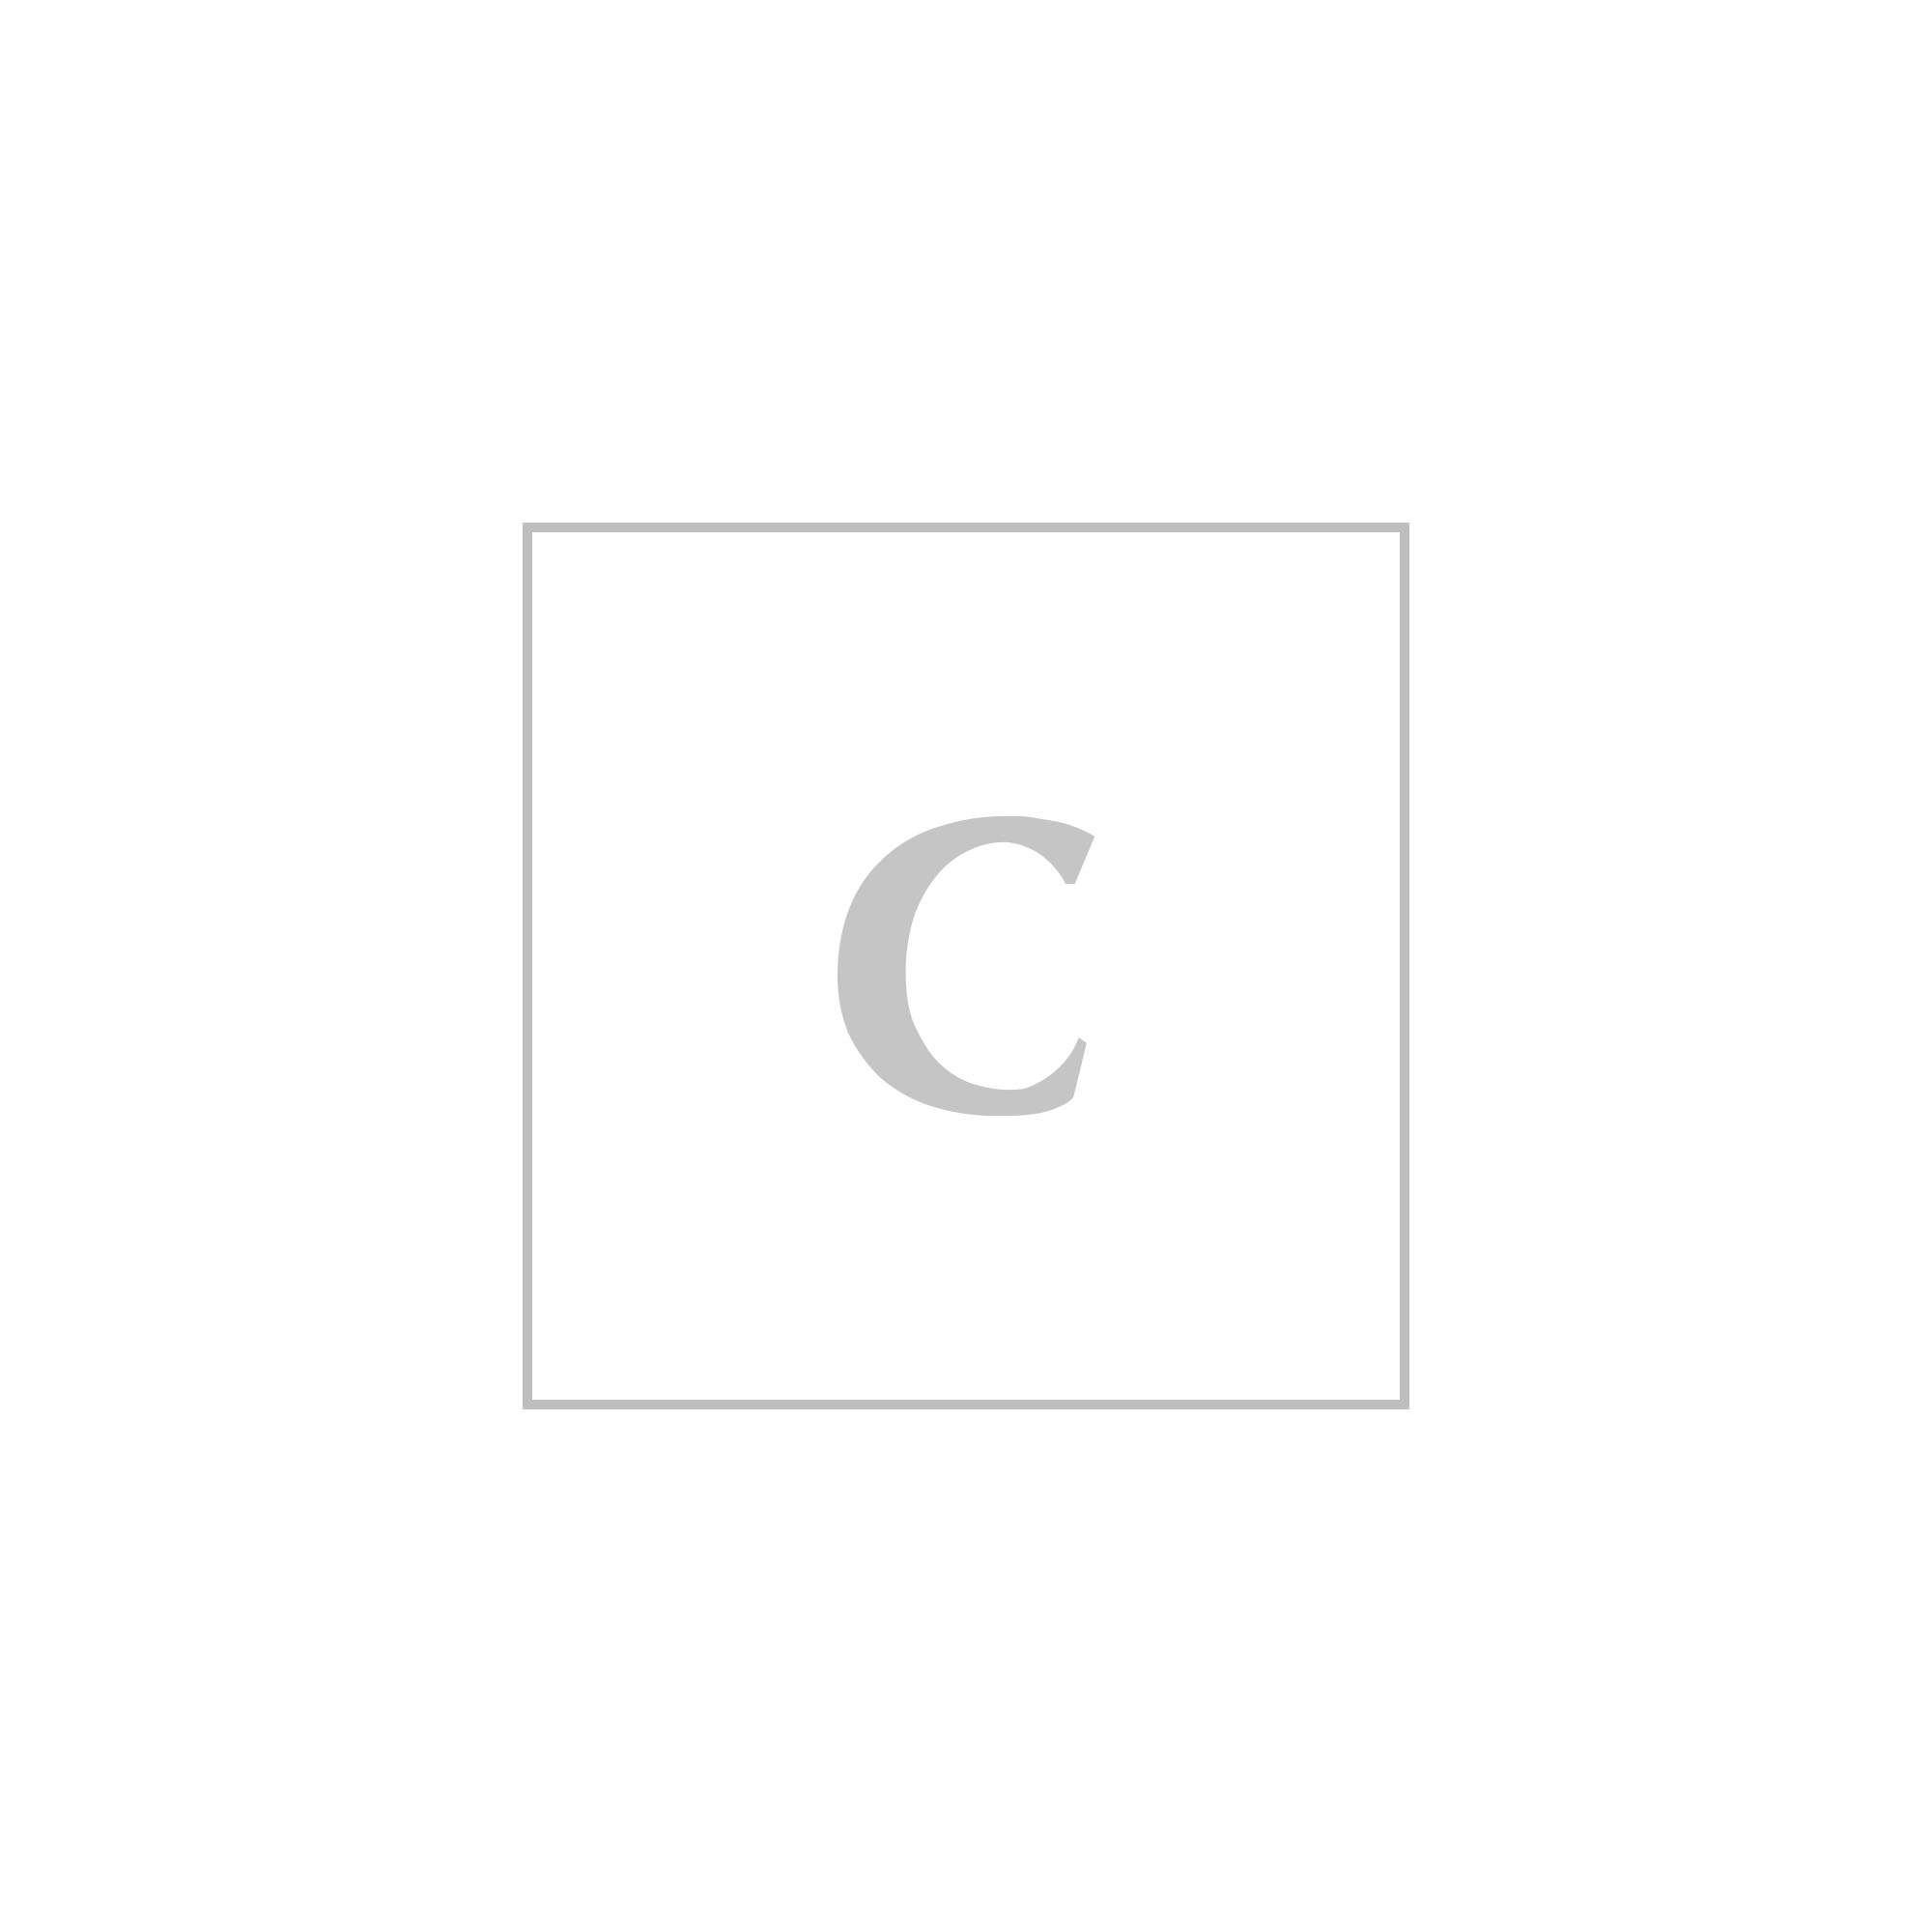 Fendi portafoglio continental vitello century bag bugs